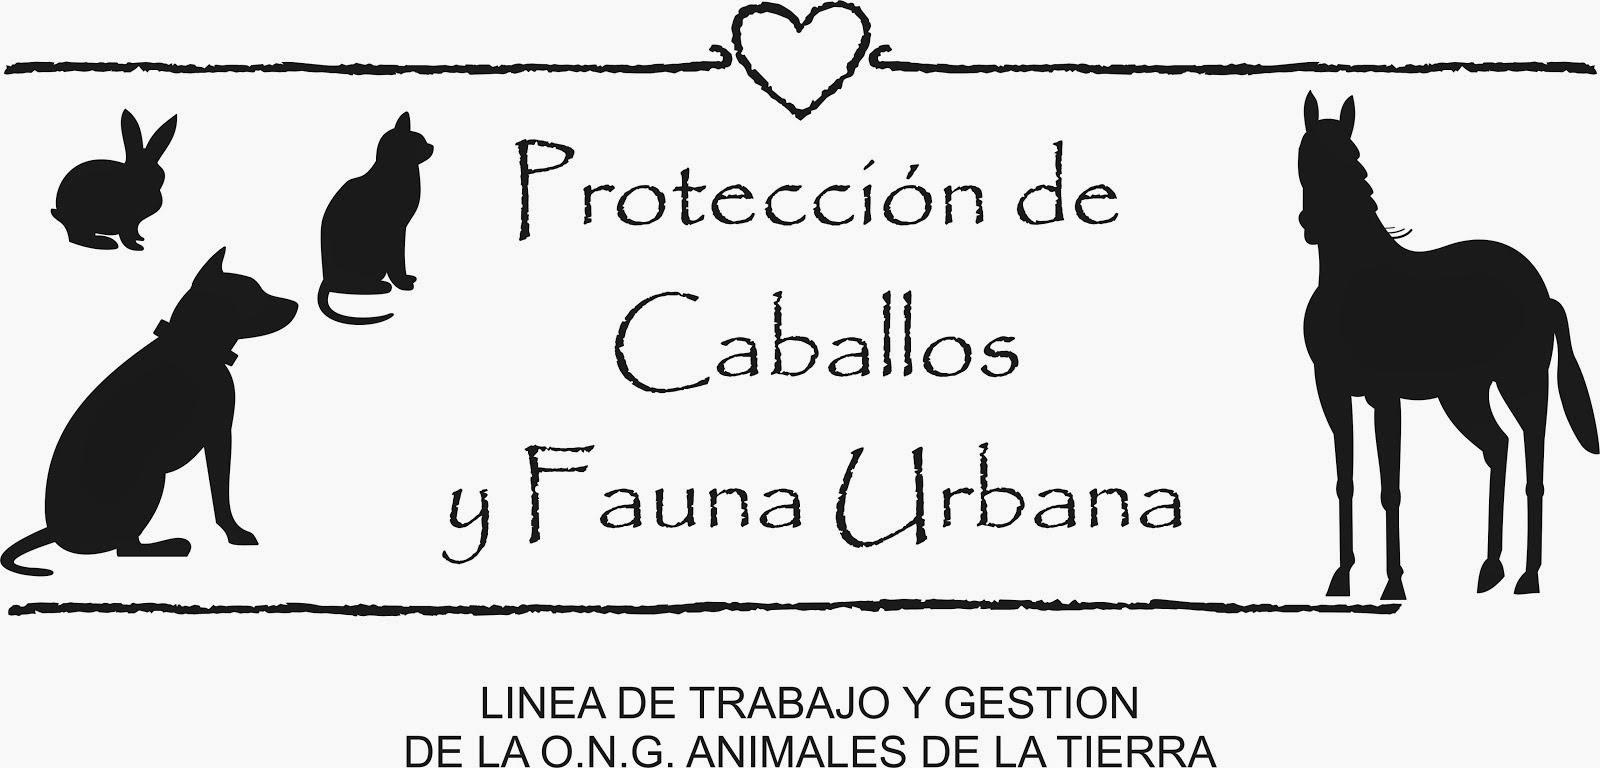 PROTECCION de FAUNA URBANA